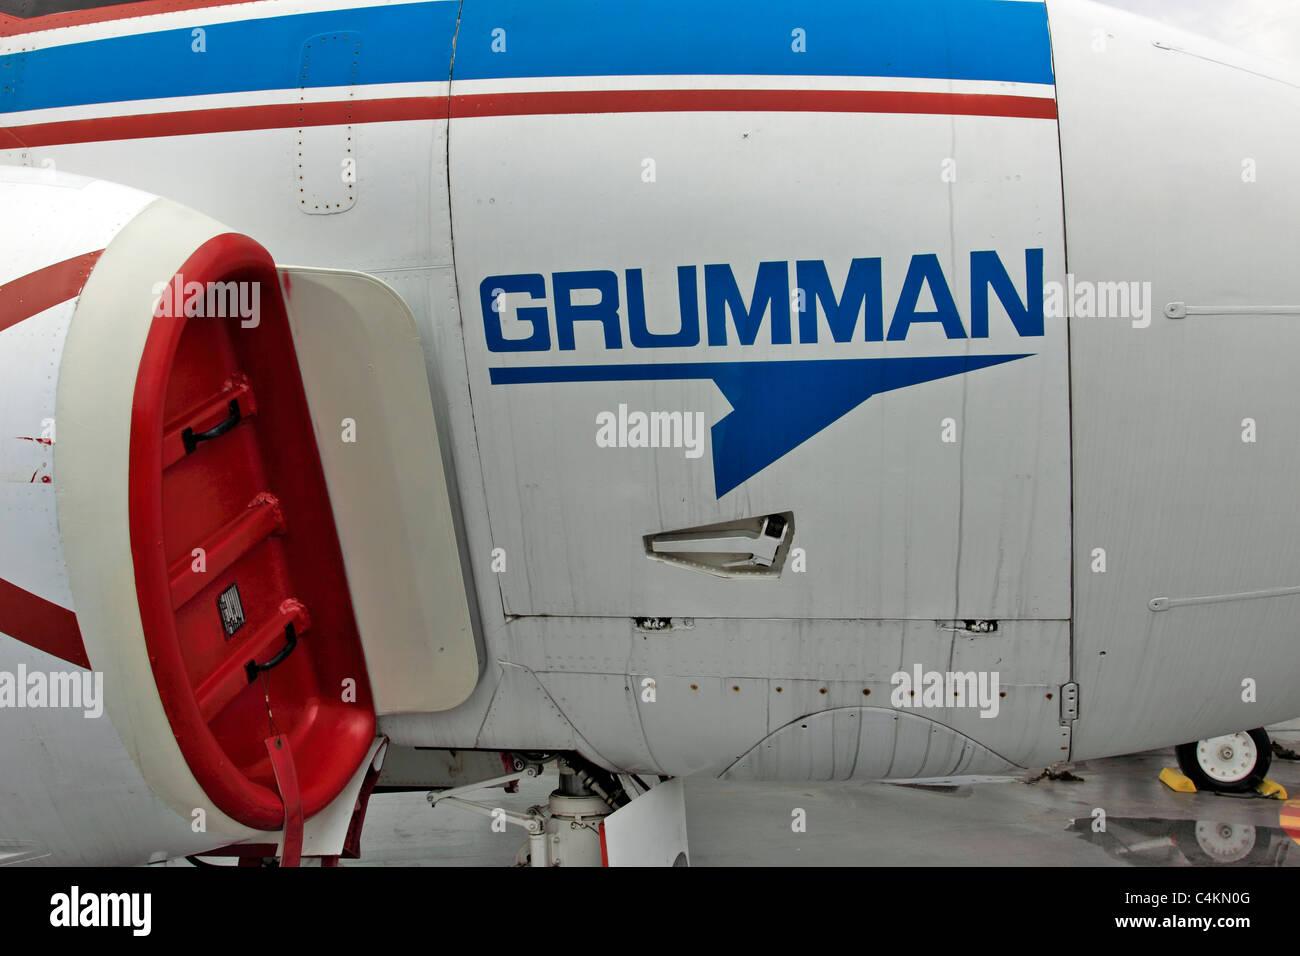 Engine intake of Grumman A-6 Intruder on the flight deck of the USS Intrepid Aircraft Carrier museum Manhattan New - Stock Image